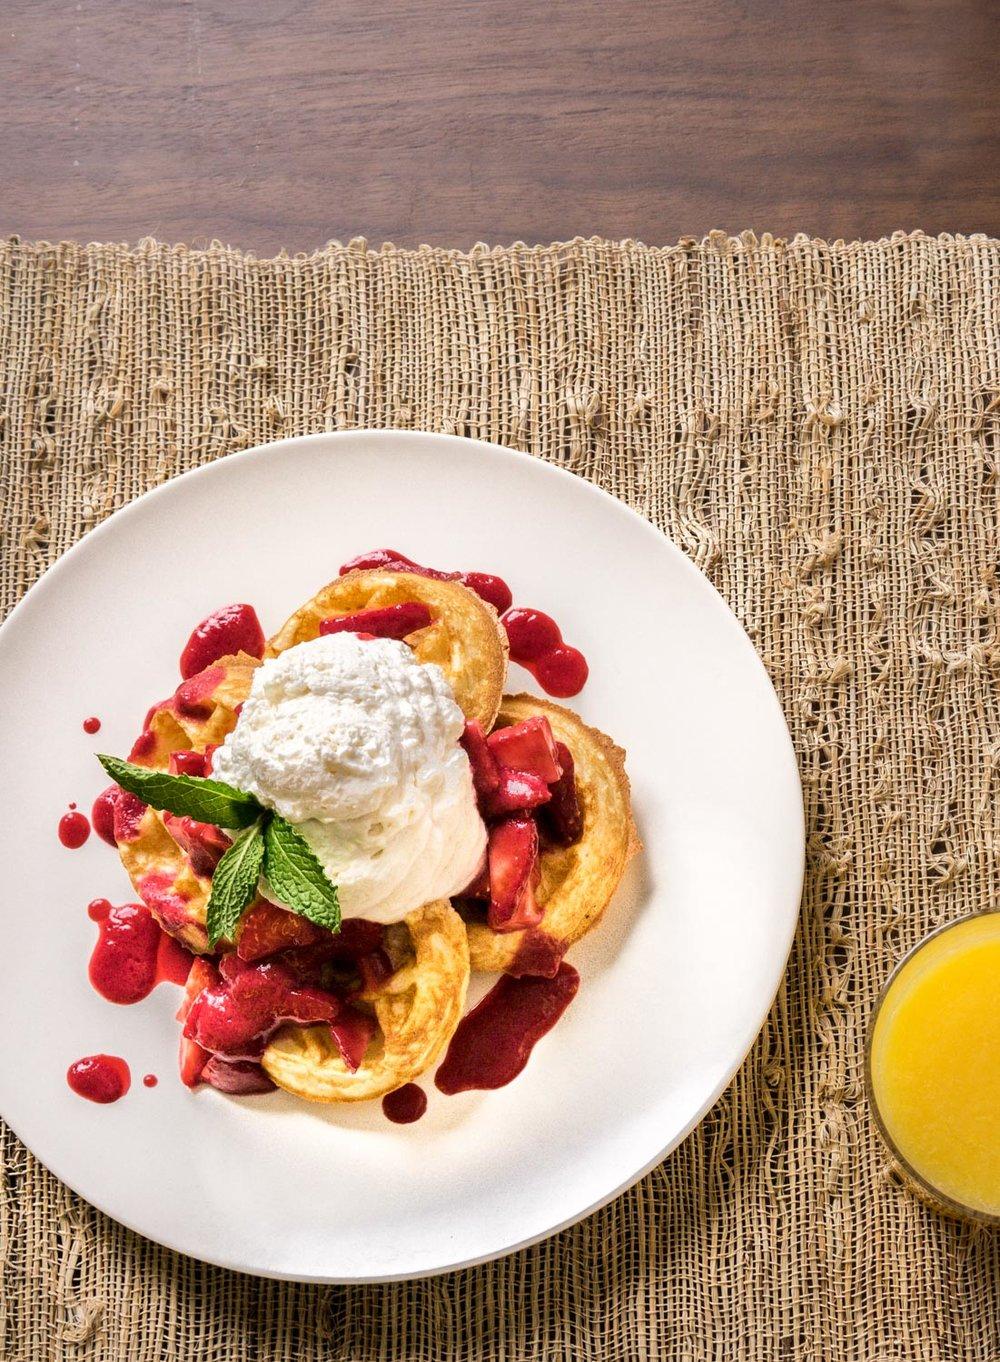 Breakfast Waffles at San Francisco's Hotel Fusion